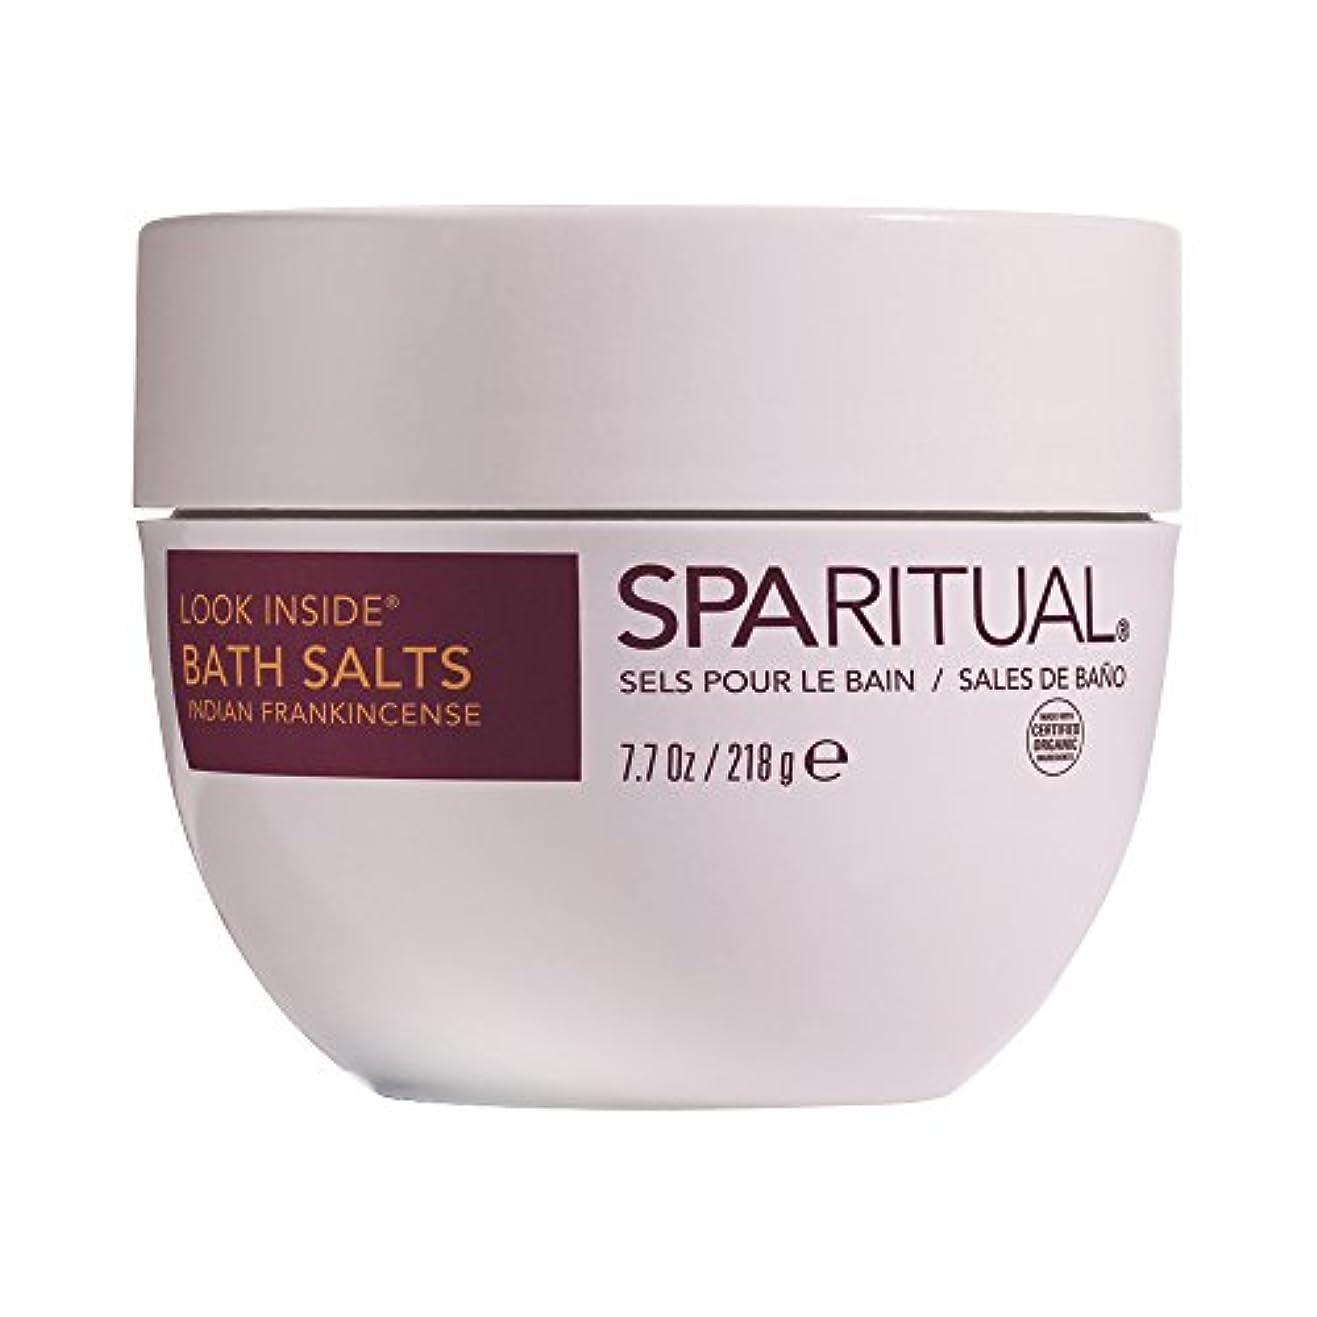 SPARITUAL(スパリチュアル) ルックインサイド オーガニック バスソルト 218g (フランキンセンスの香り)